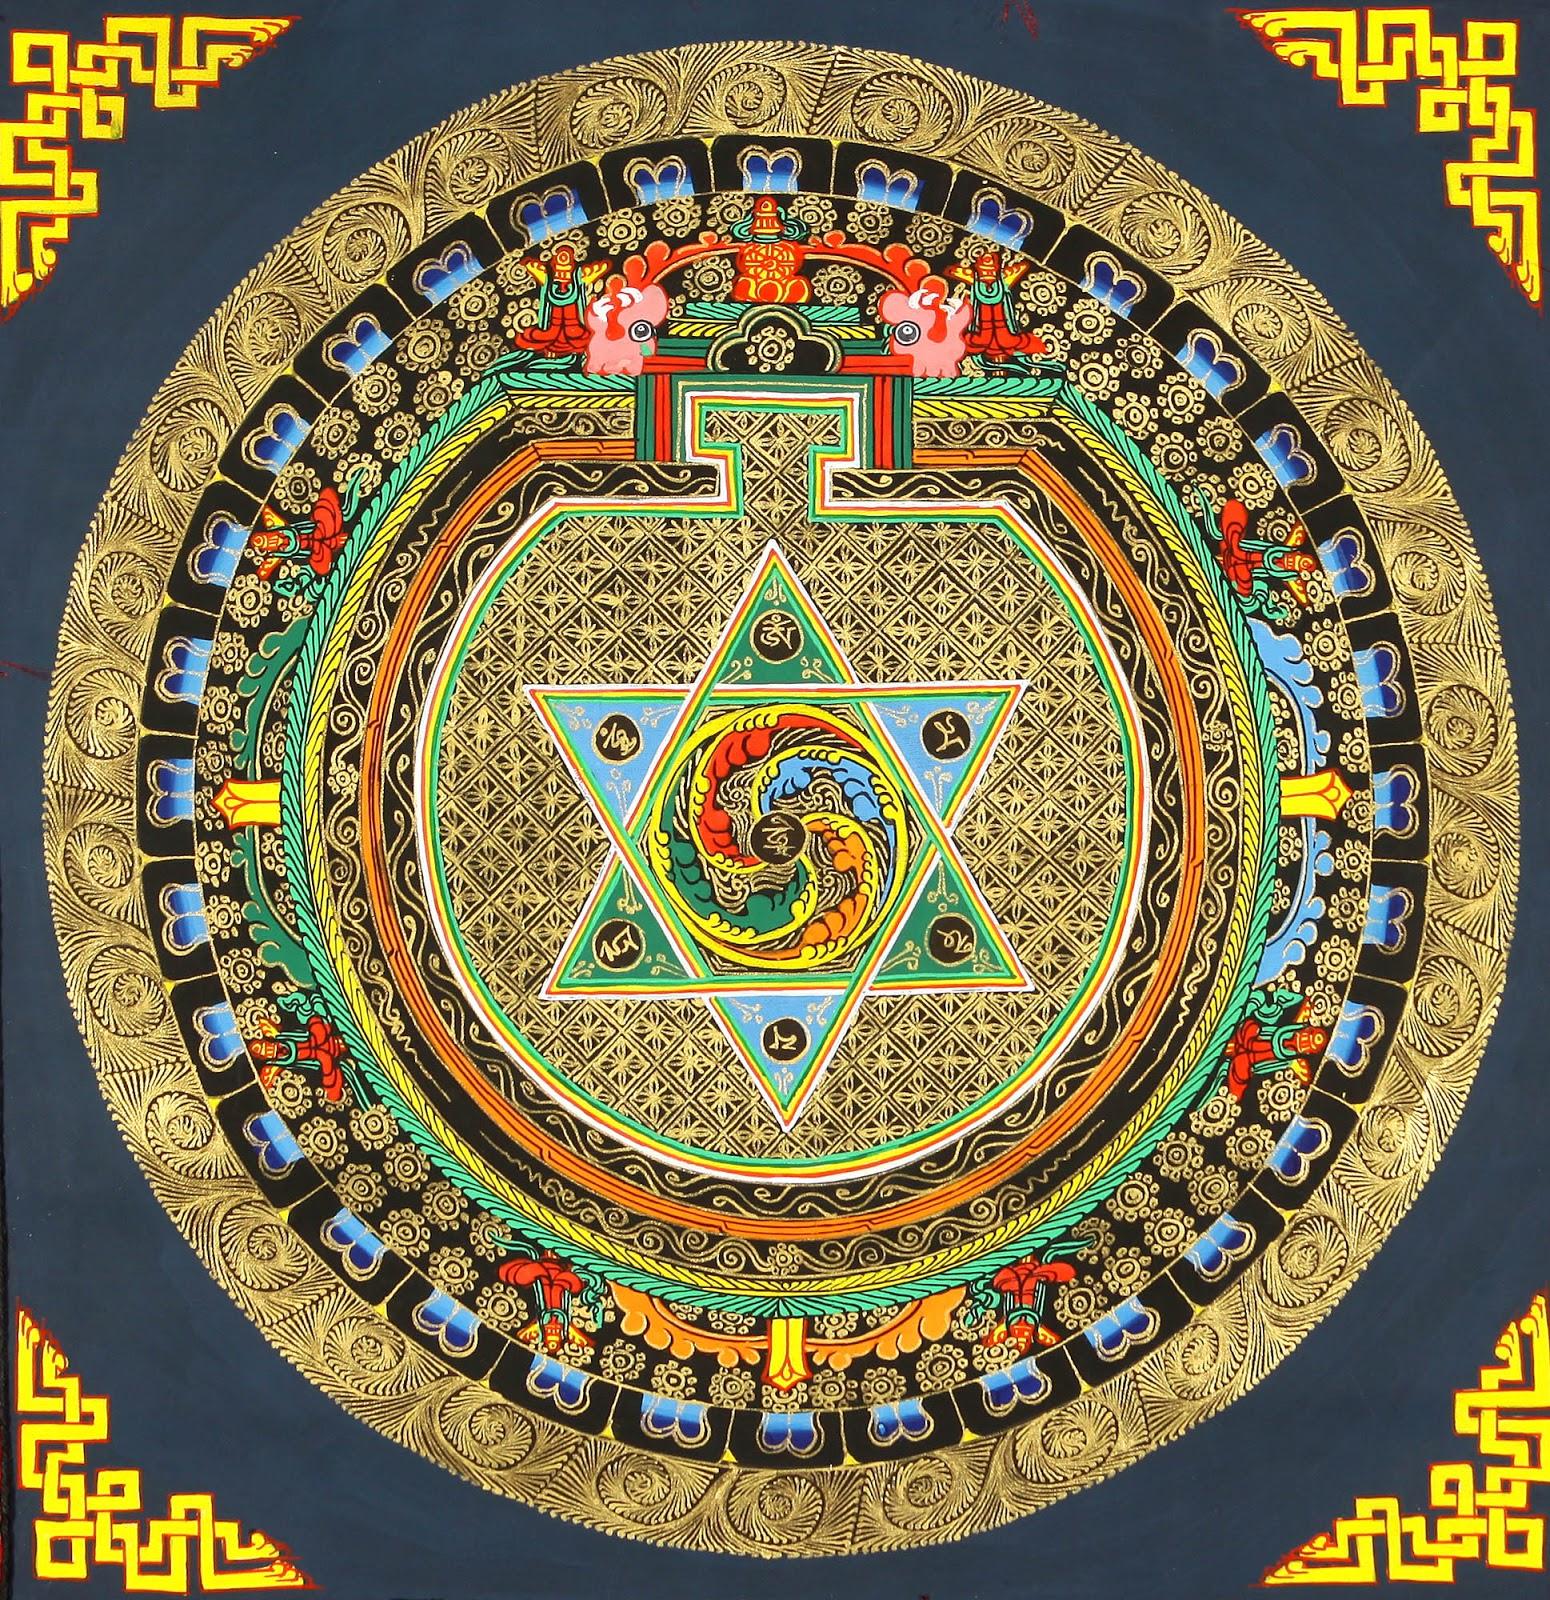 4 nobles verdades del budismo yahoo dating 7